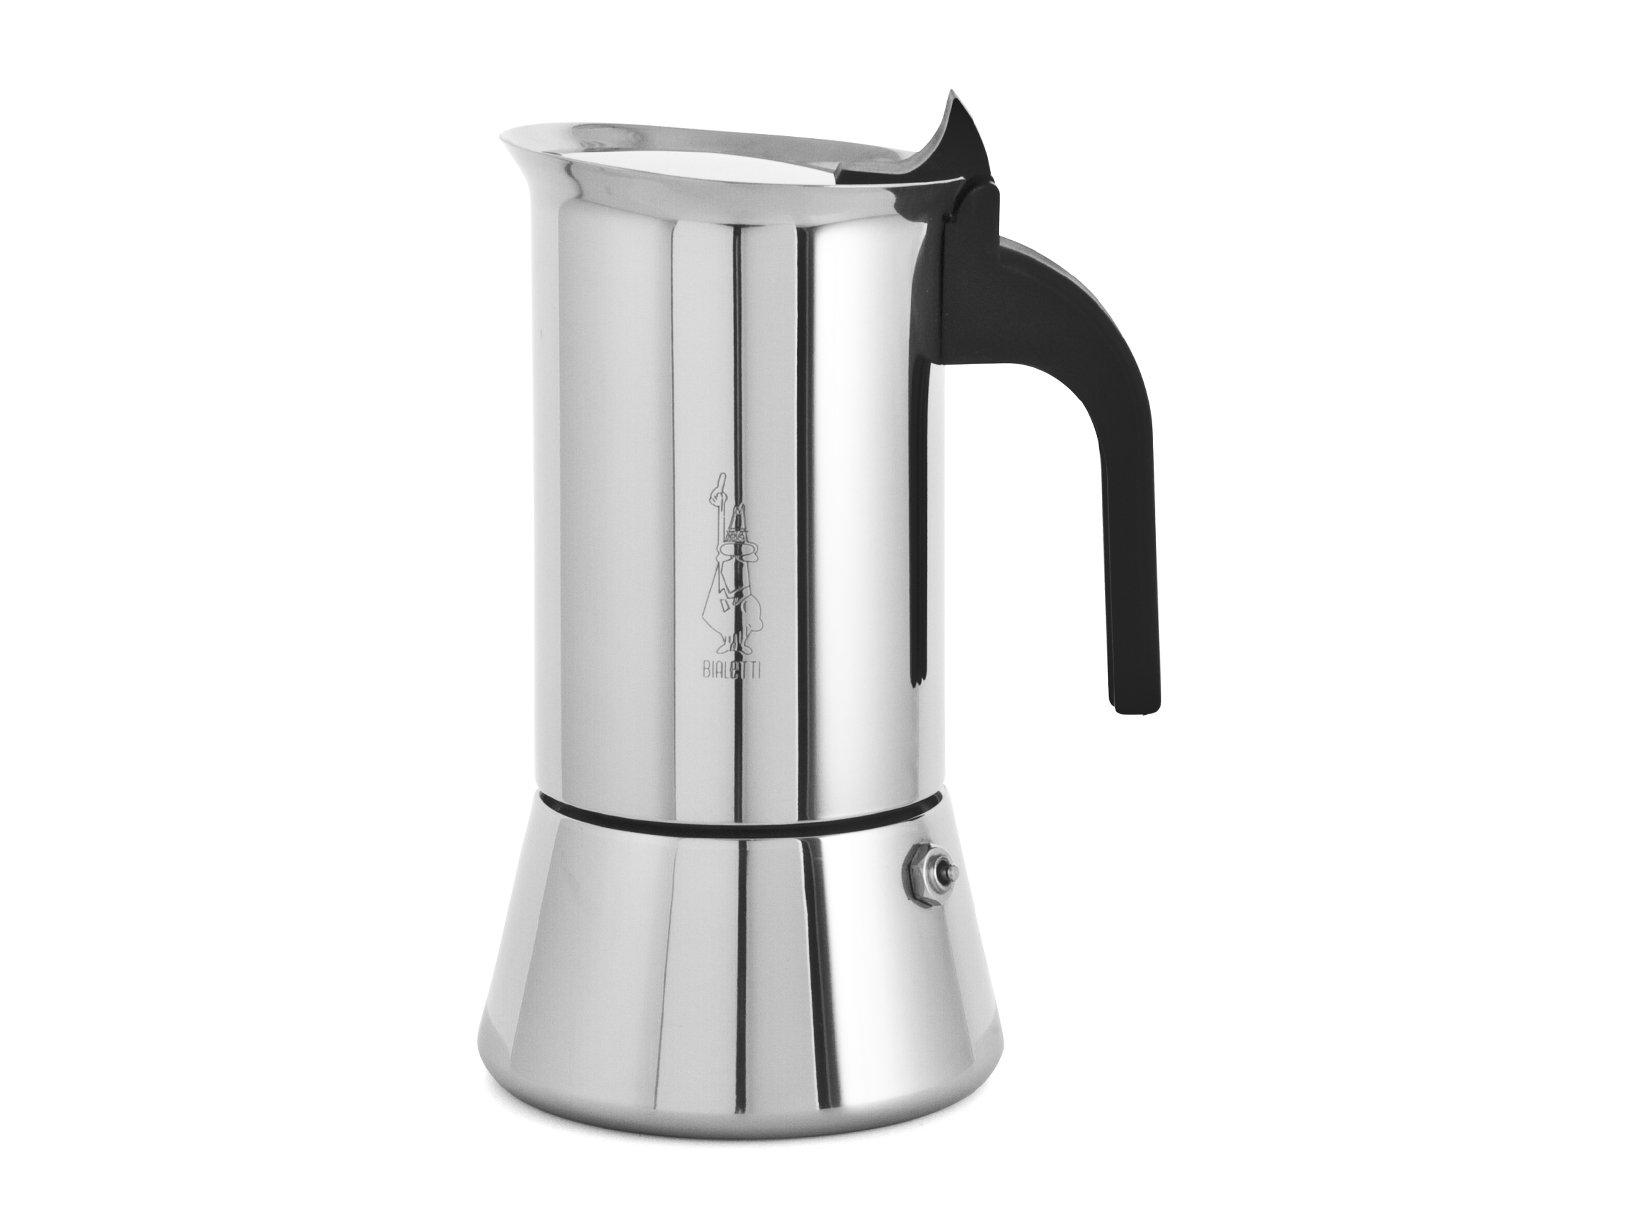 Bialetti Elegance Venus Induction Stovetop Coffee Maker 6-cups [ Italian Import ]